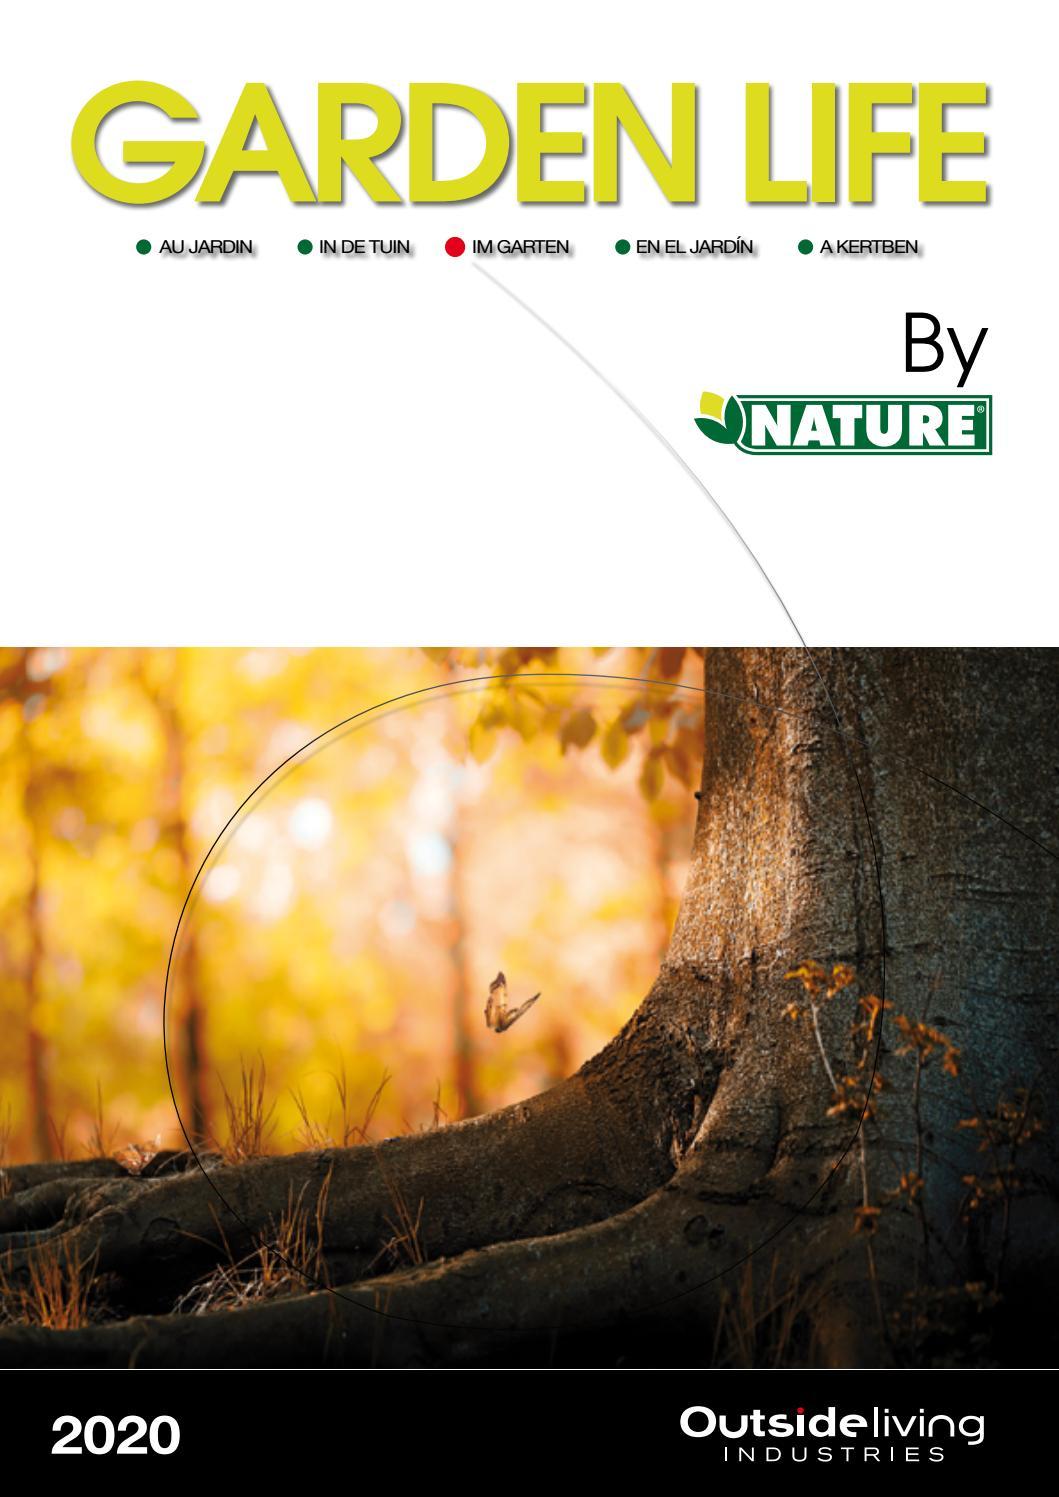 Nature 2018 Gb By ____ - Issuu concernant Vermiculite Jardin